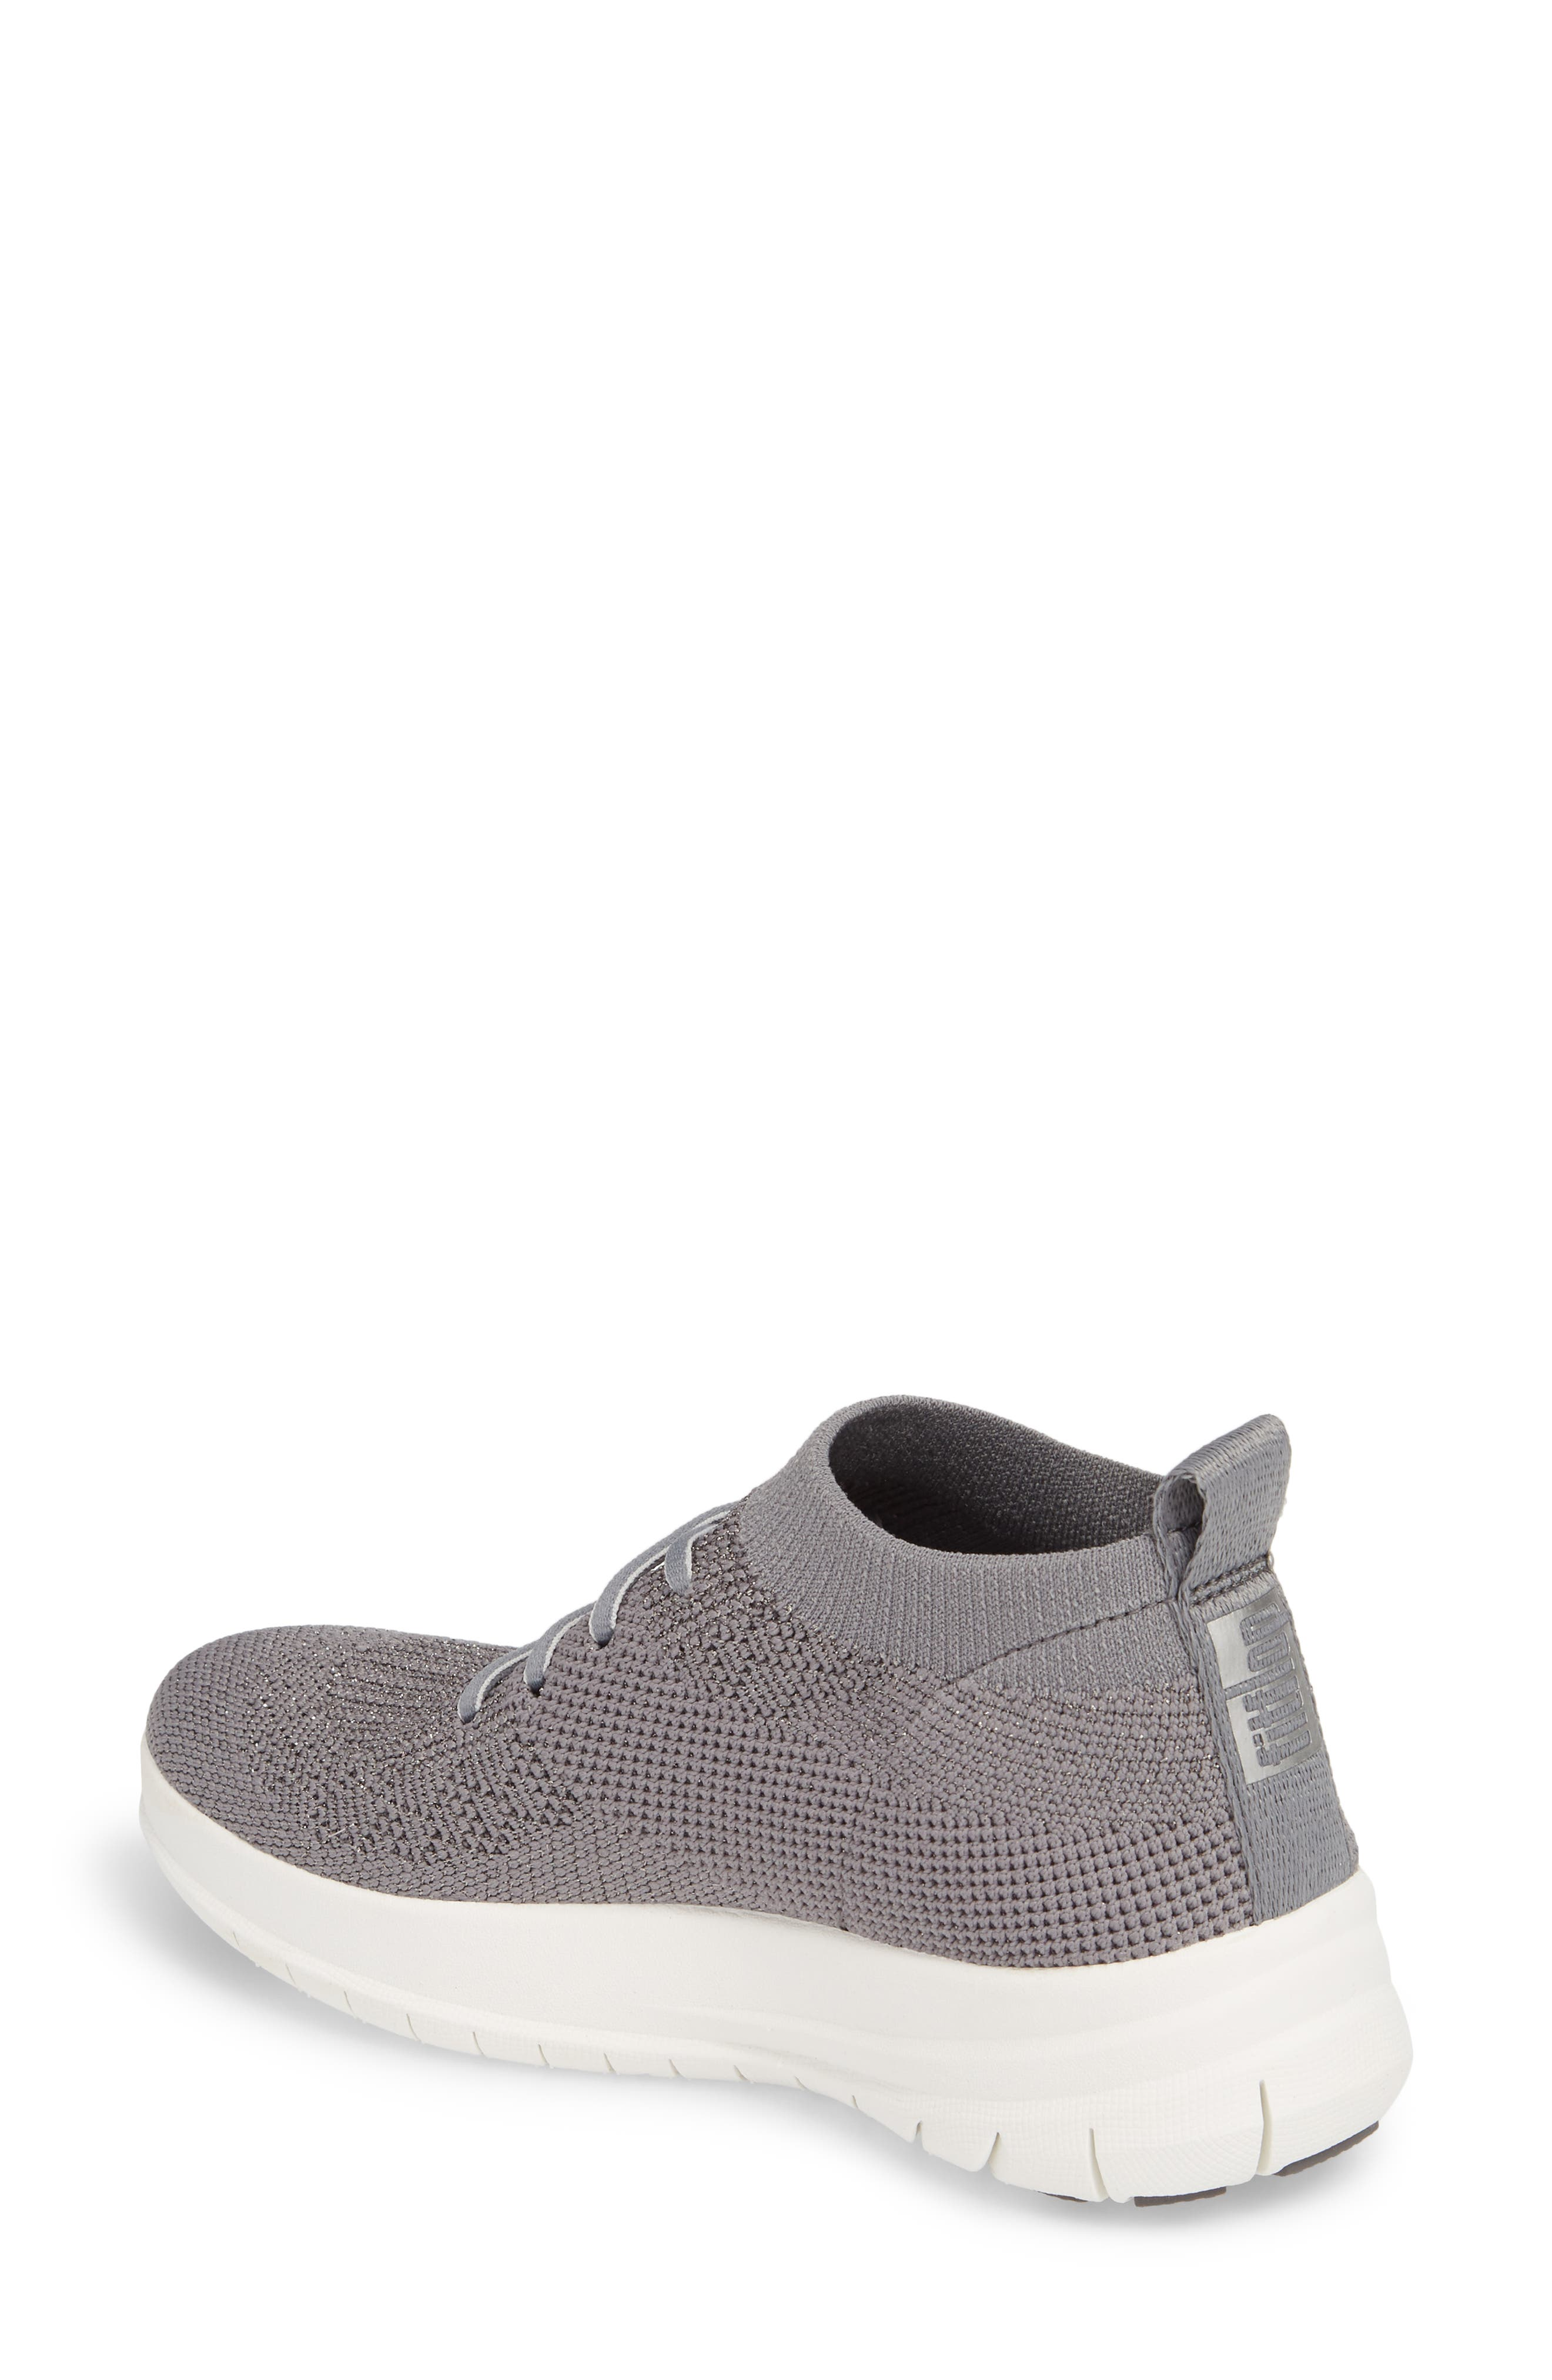 Alternate Image 2  - FitFlop Uberknit™ Slip-On High-Top Sneaker (Women)